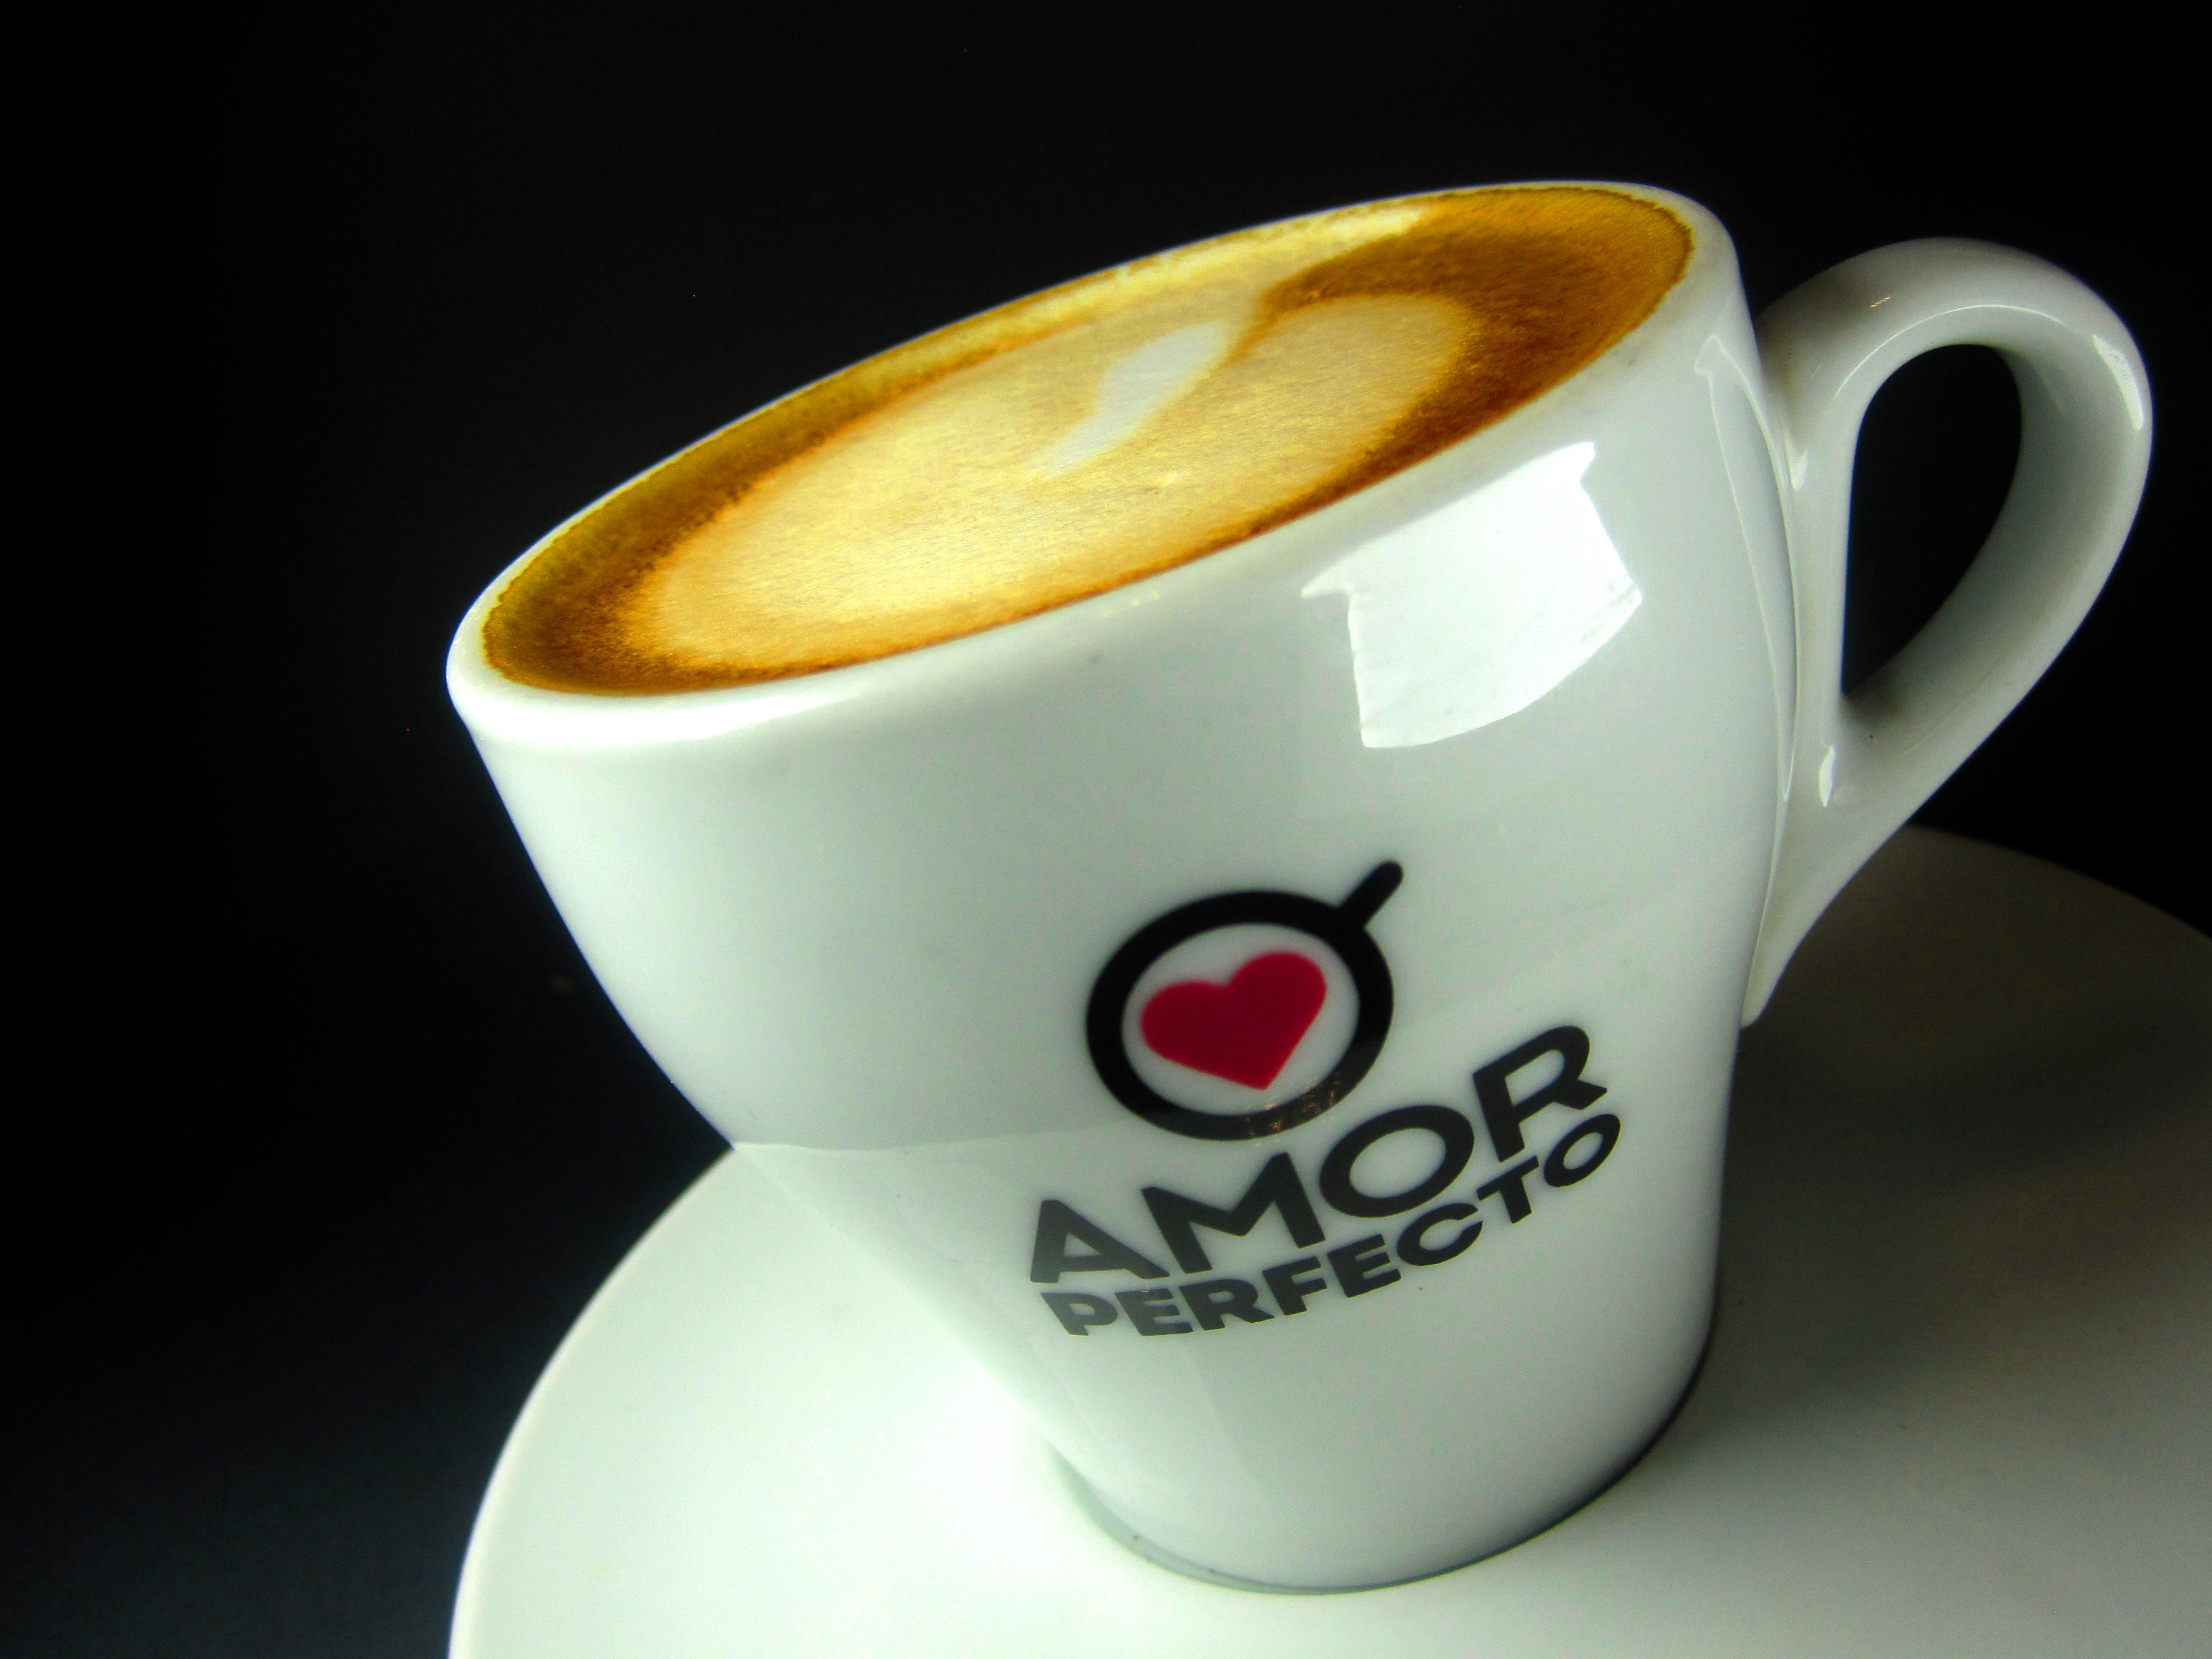 AMOR PERFECTO COFFEE